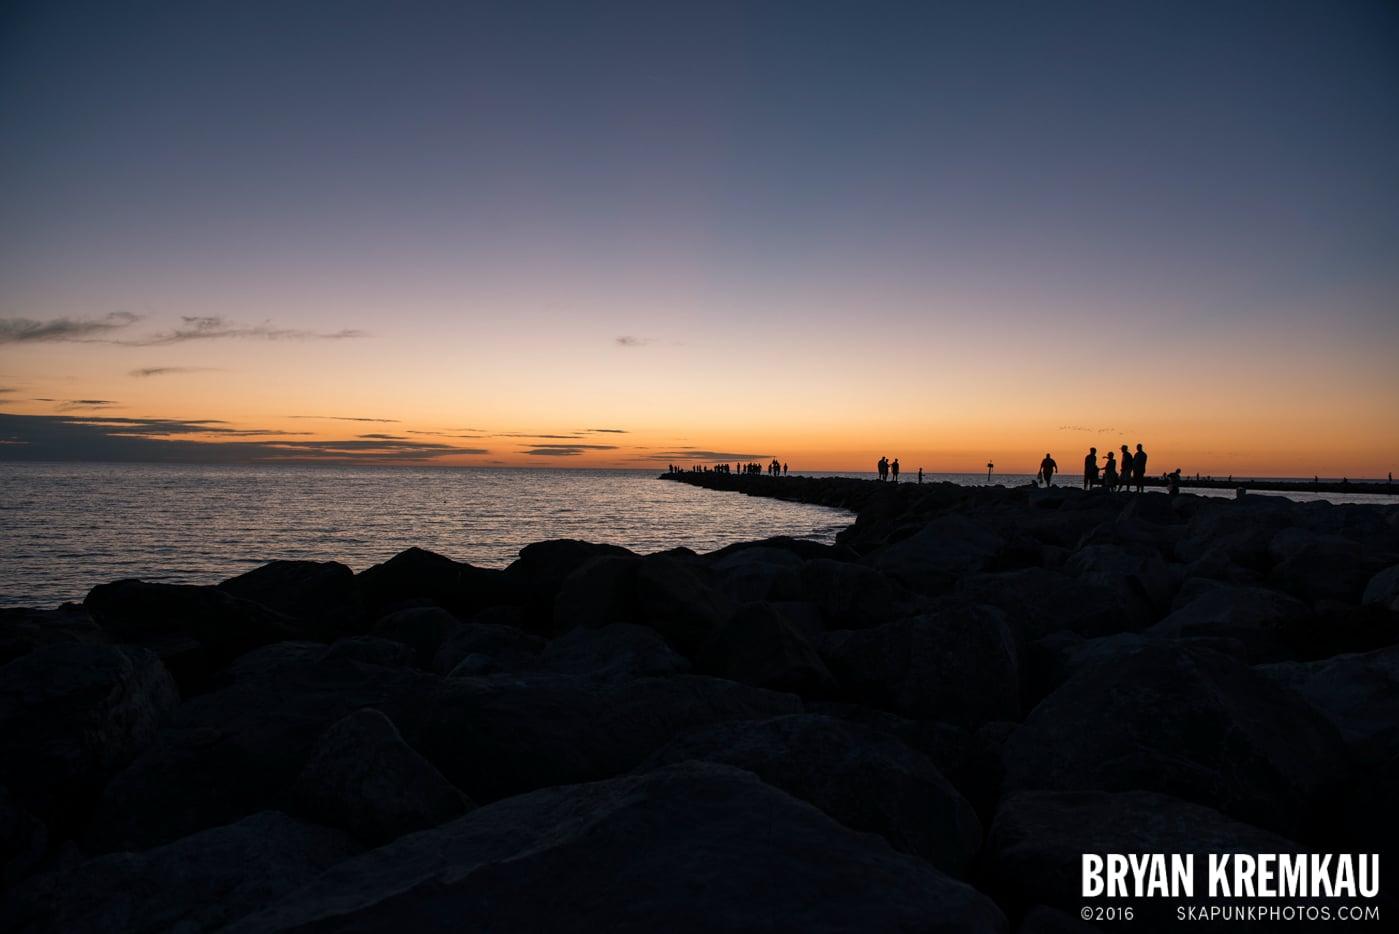 Sunsets, Astrophotography & Birds @ Venice, Florida - 10.25.14 - 11.5.14 (124)